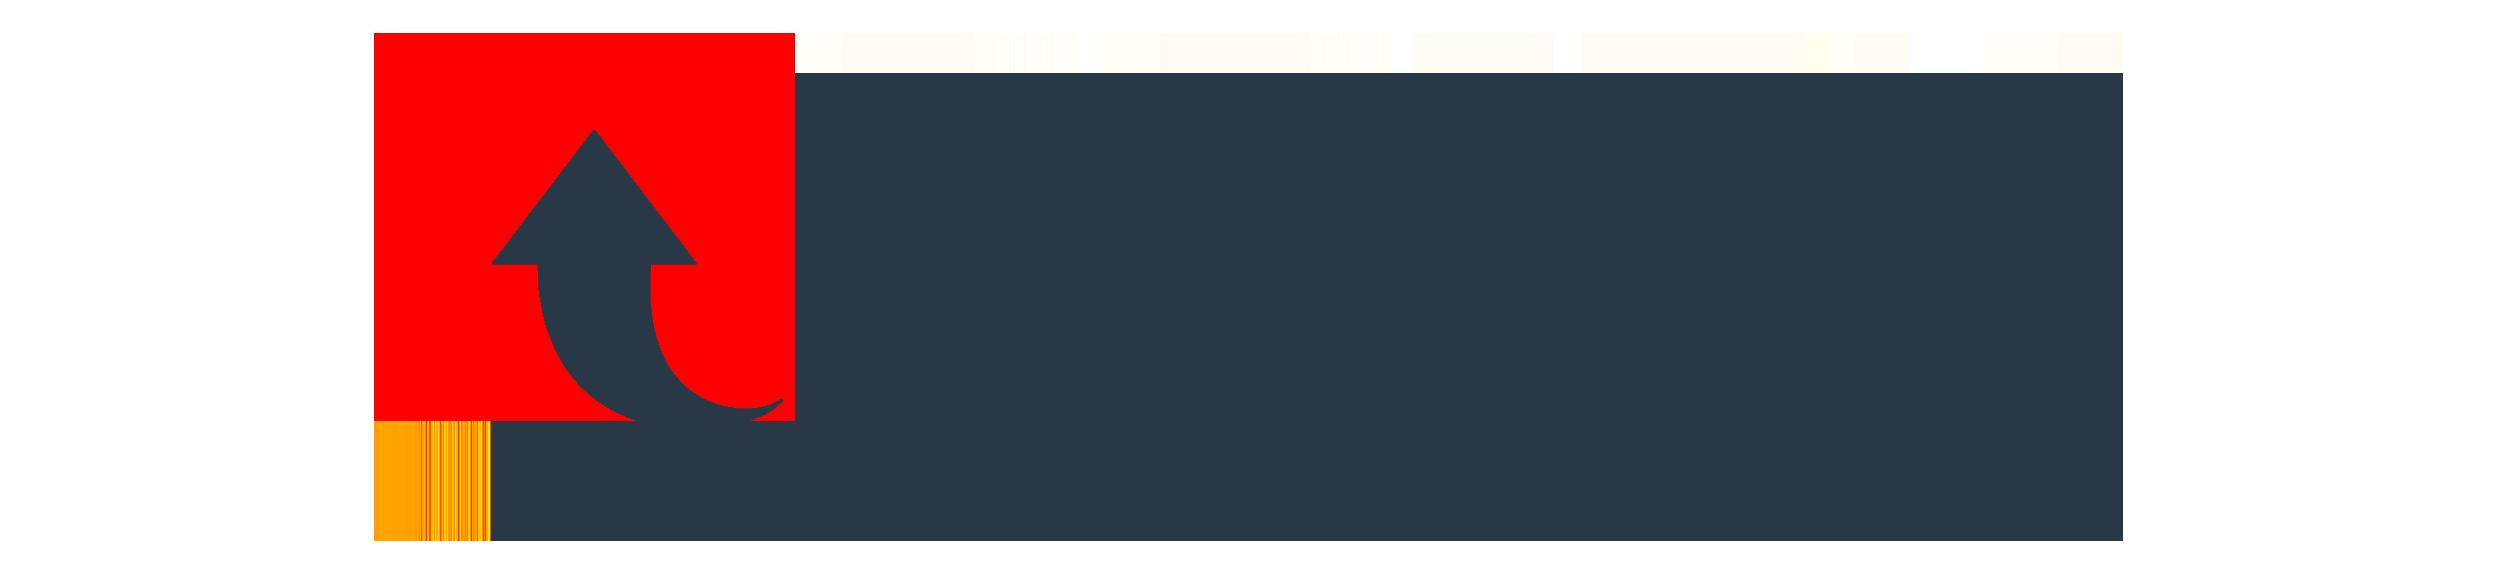 Adrien Martinez - Site Officiel